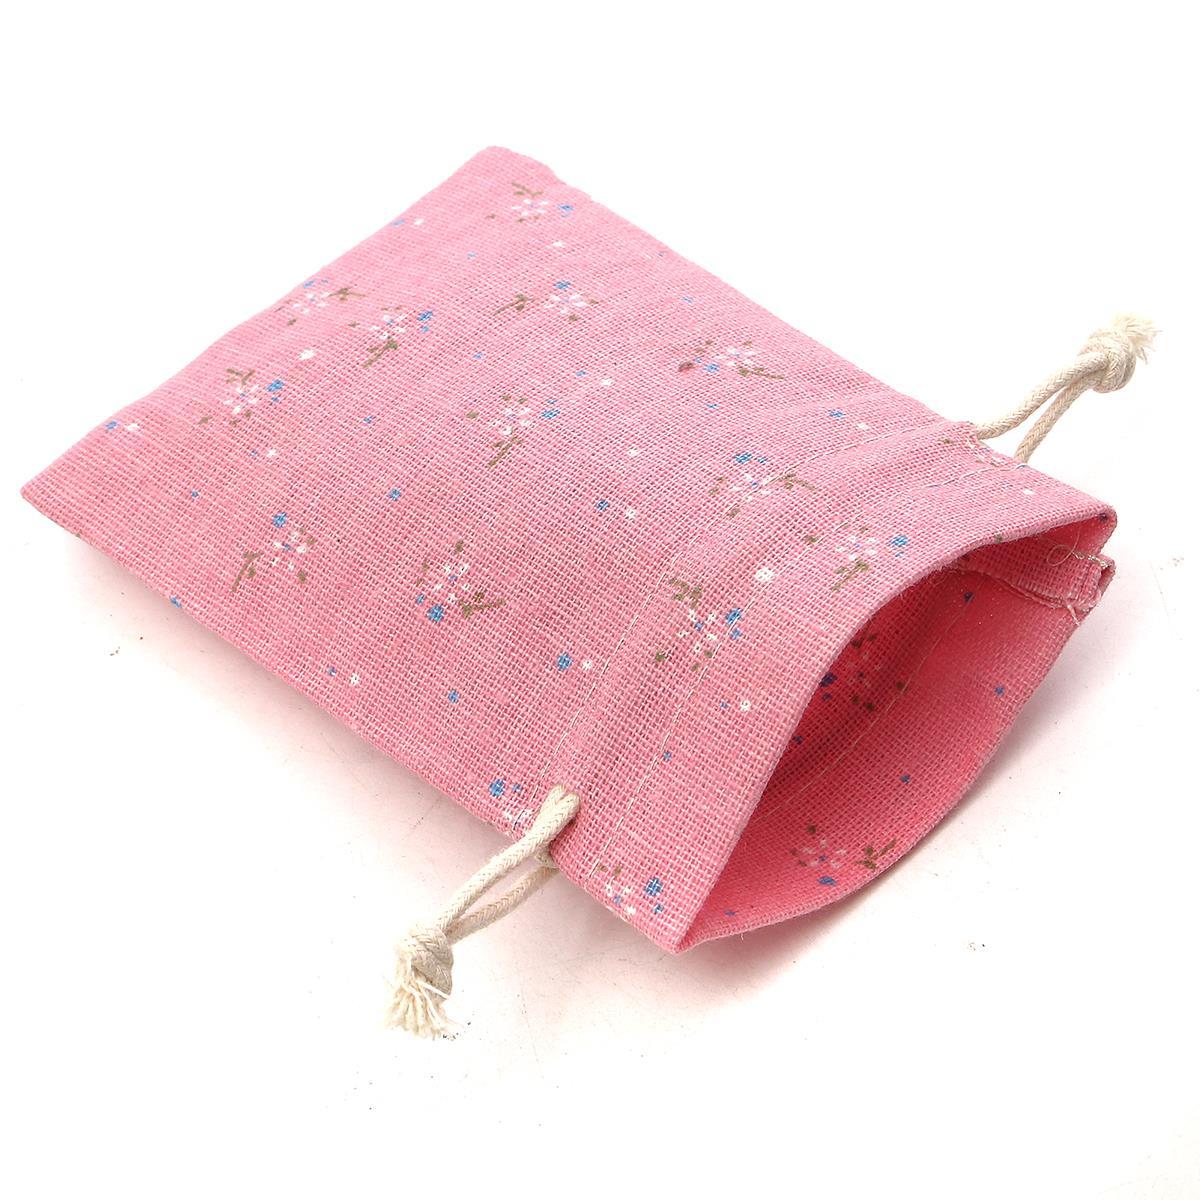 Aliexpress.com : Buy 10Pcs/lot Gift Bags Linen Cotton Wedding Party ...